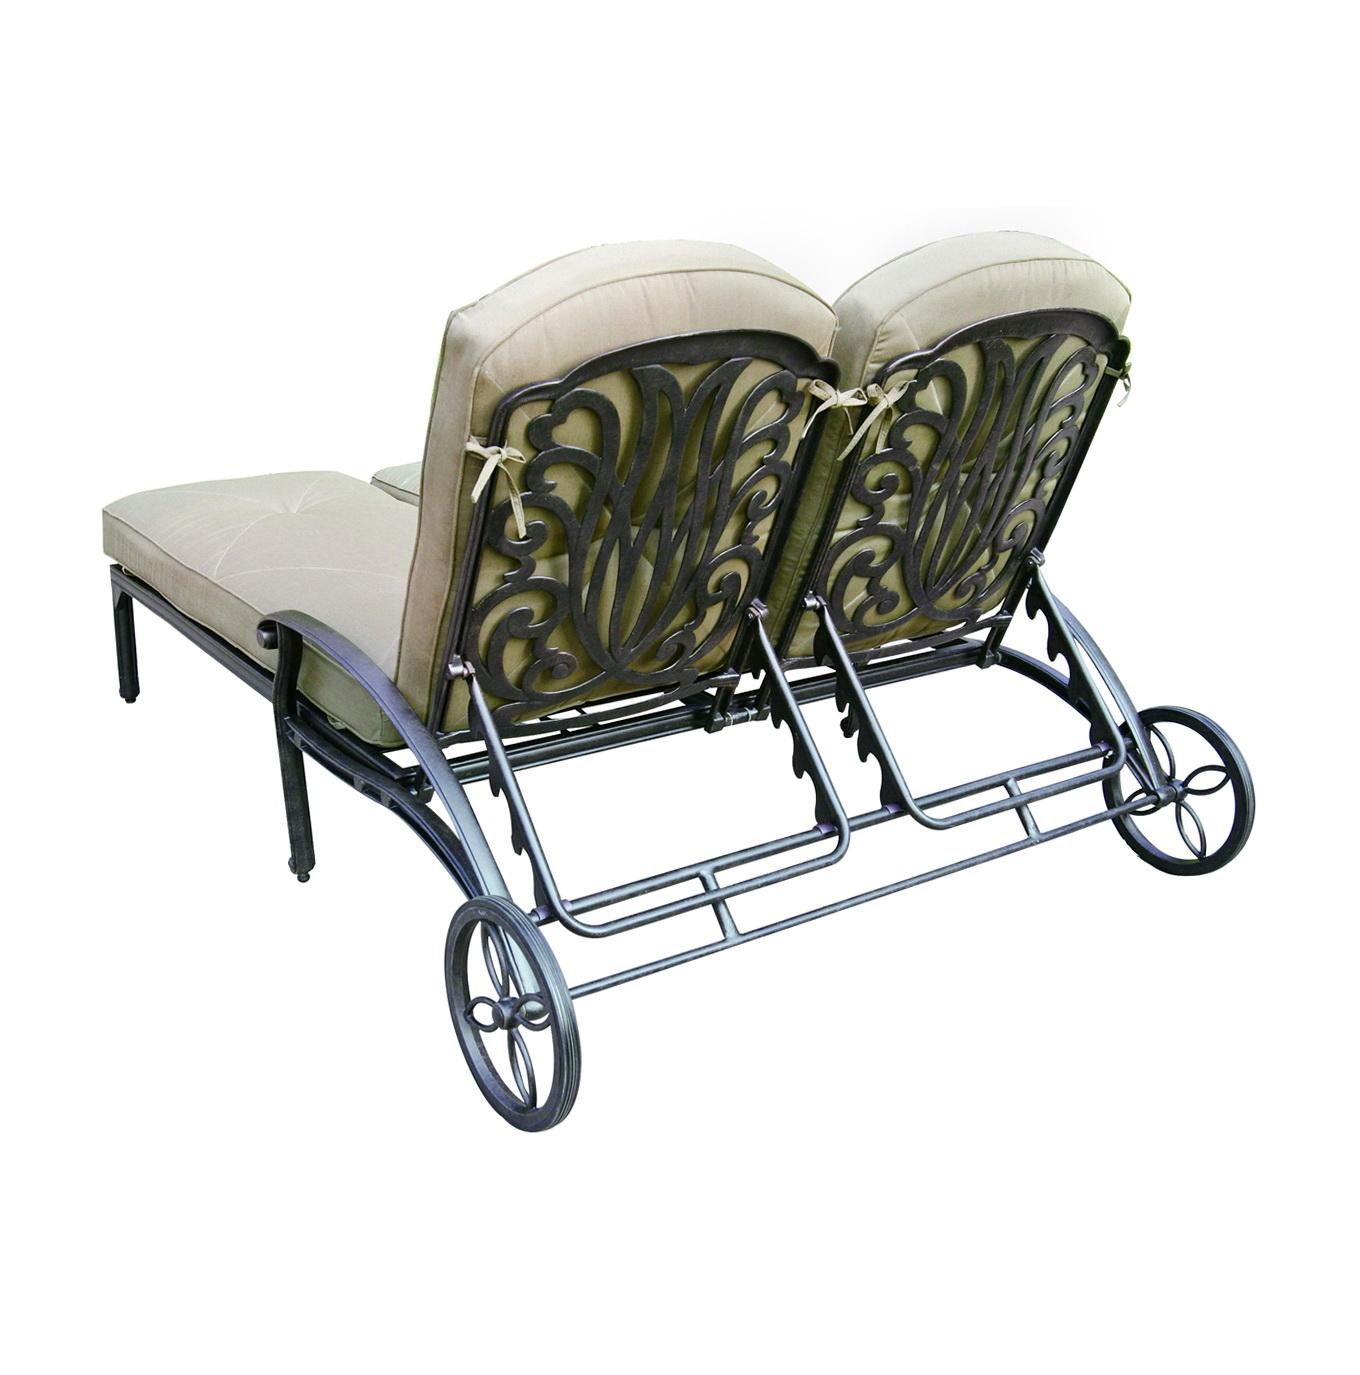 patio lounge chairs walmart plastic chair rail moulding outdoor chaise cushions home design ideas